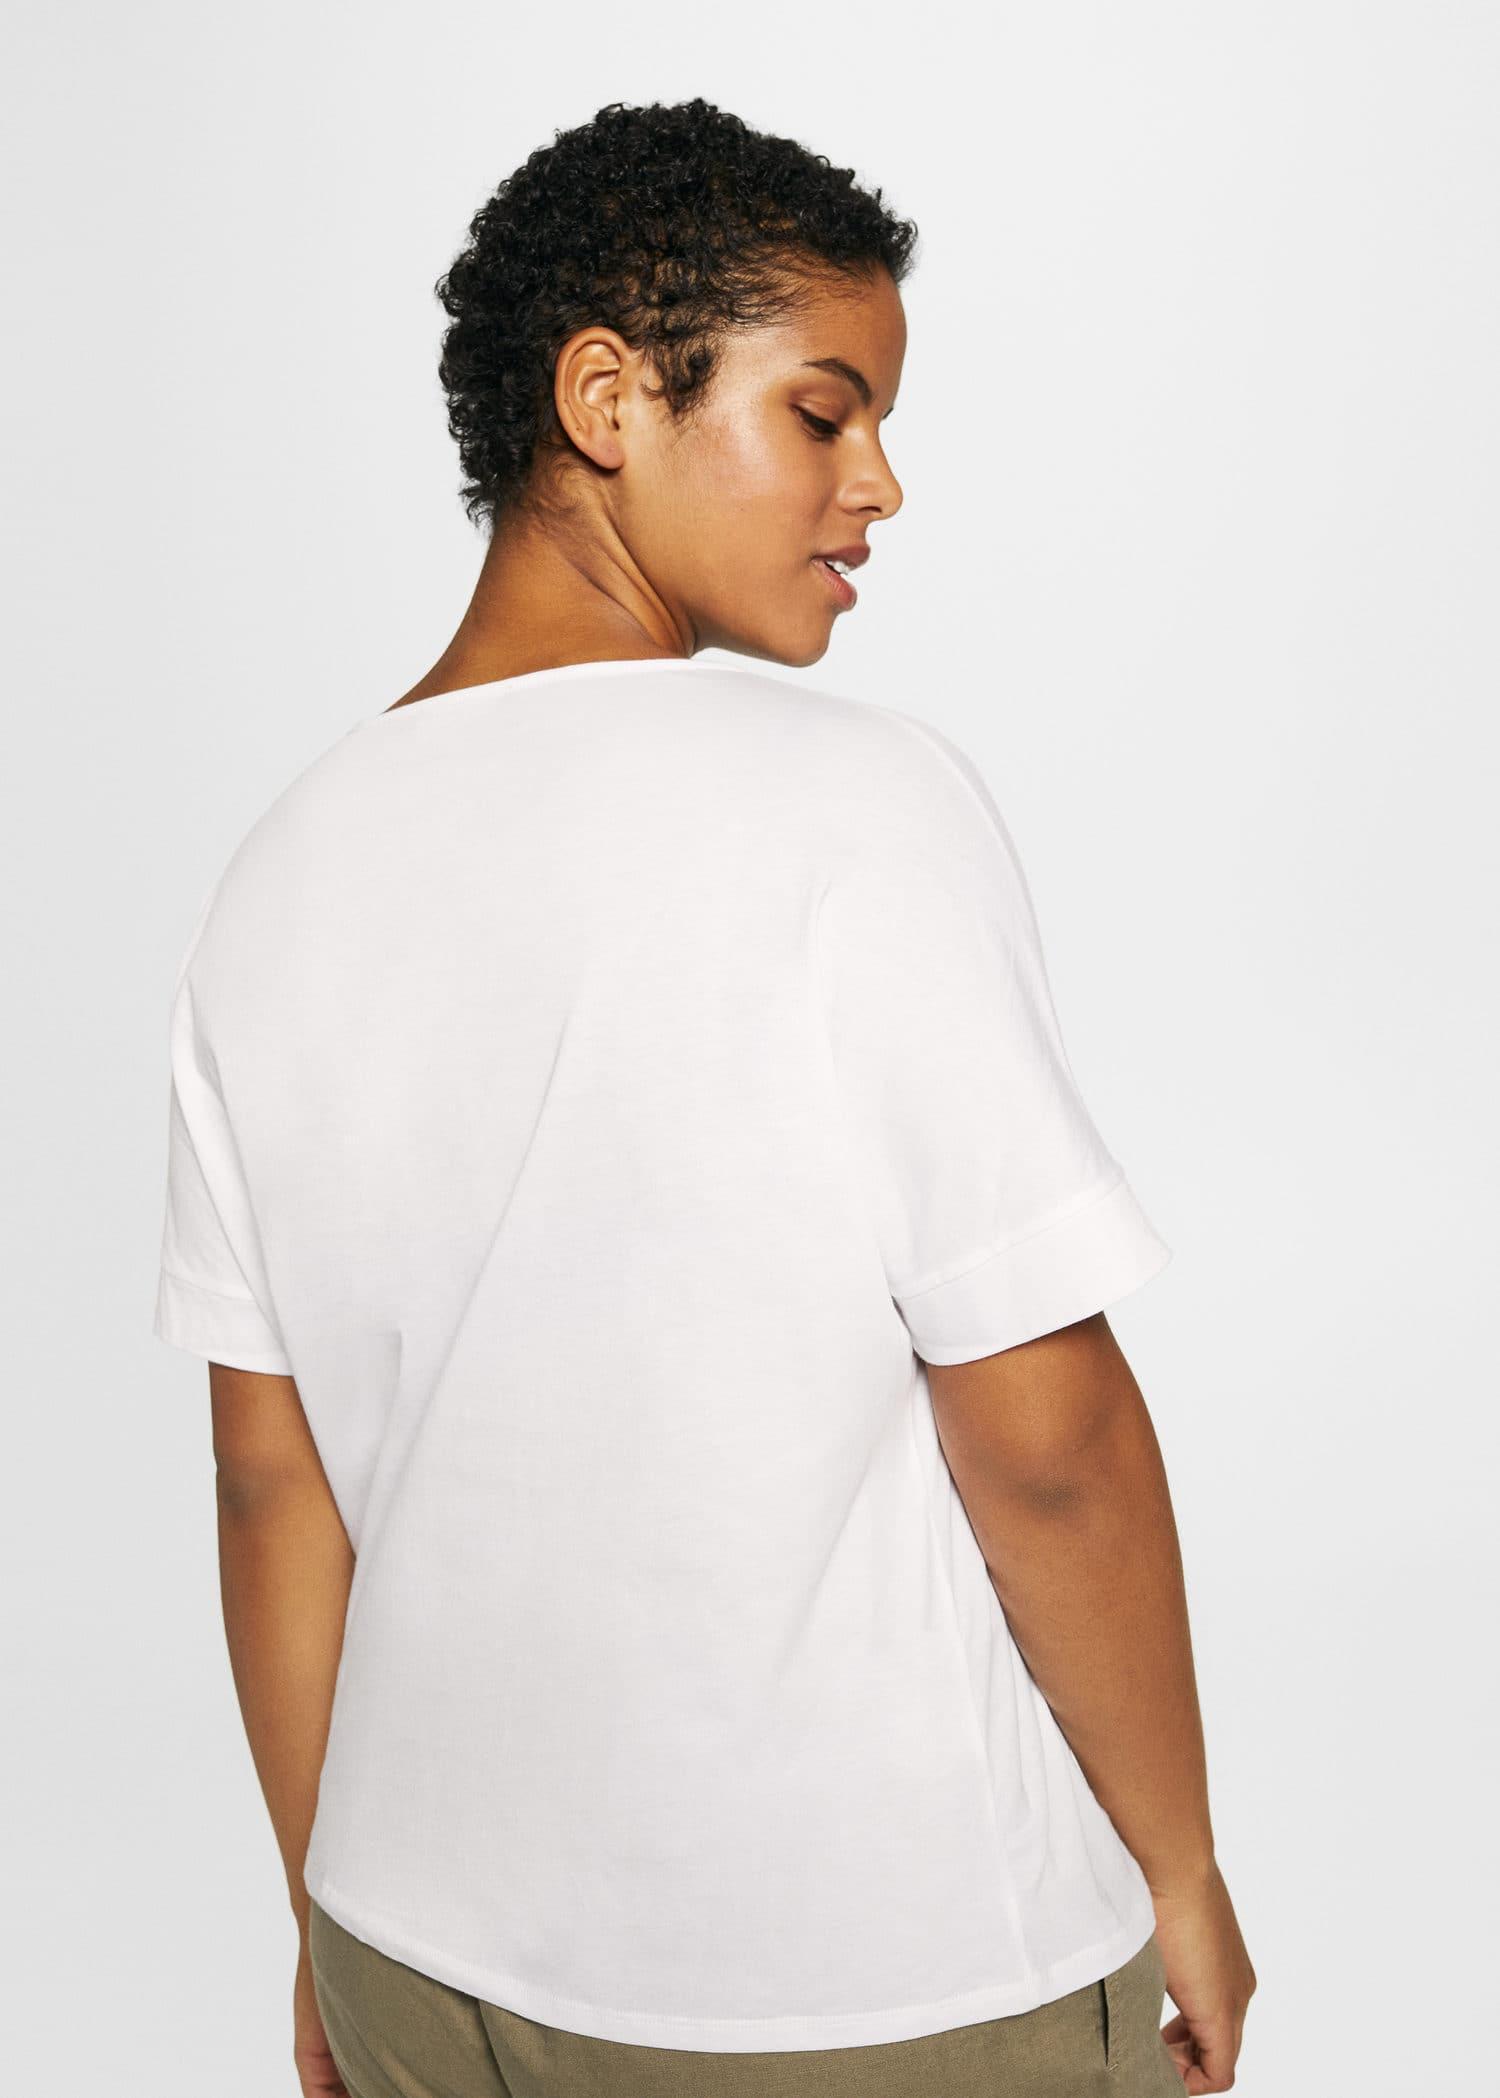 MANGO Appliqués embroidered t-shirt Free Shipping Low Cost 4vbkDJ3Q20